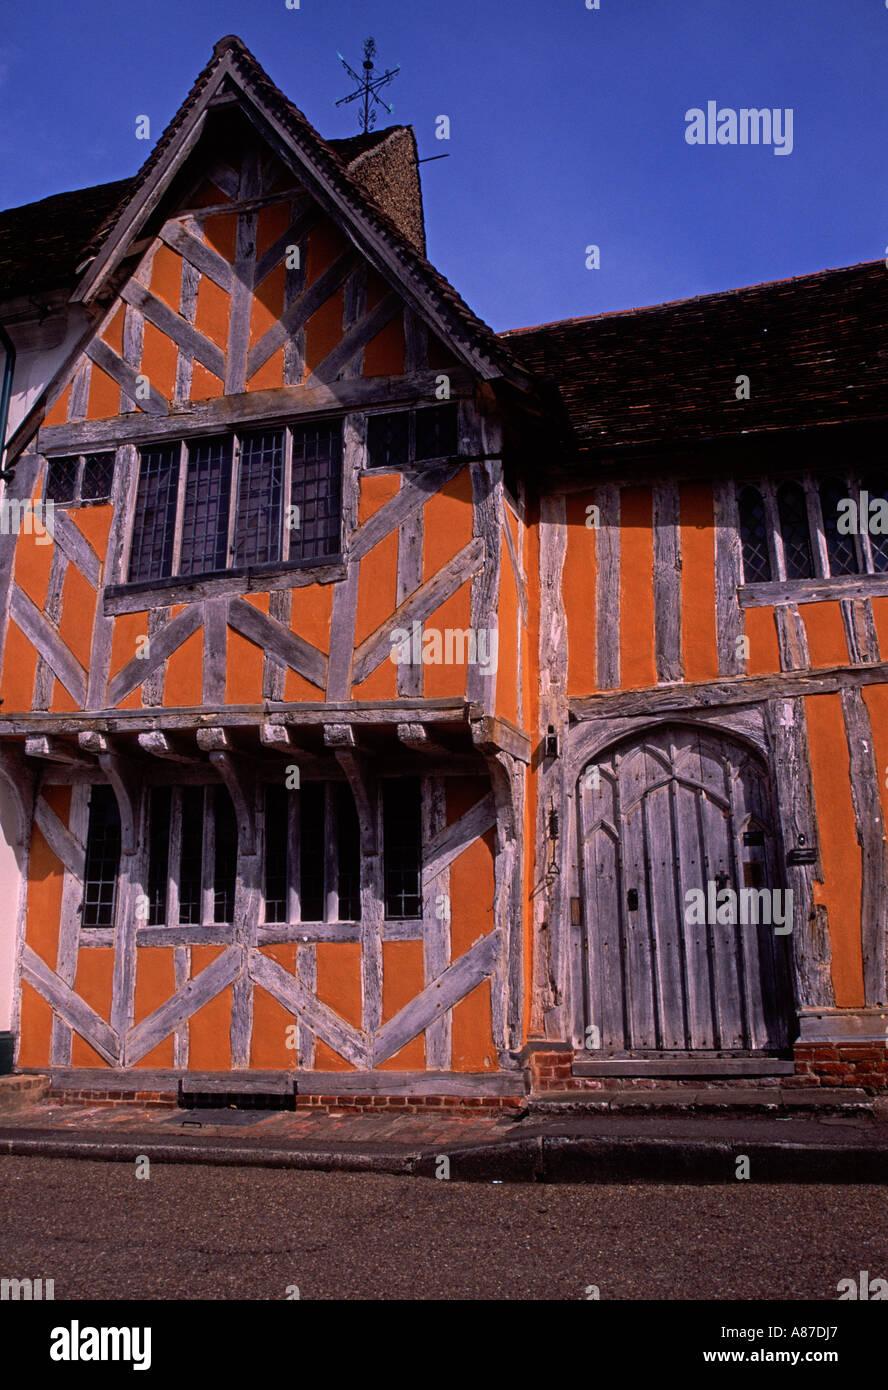 Little hall Lavenham  Suffolk England - Stock Image